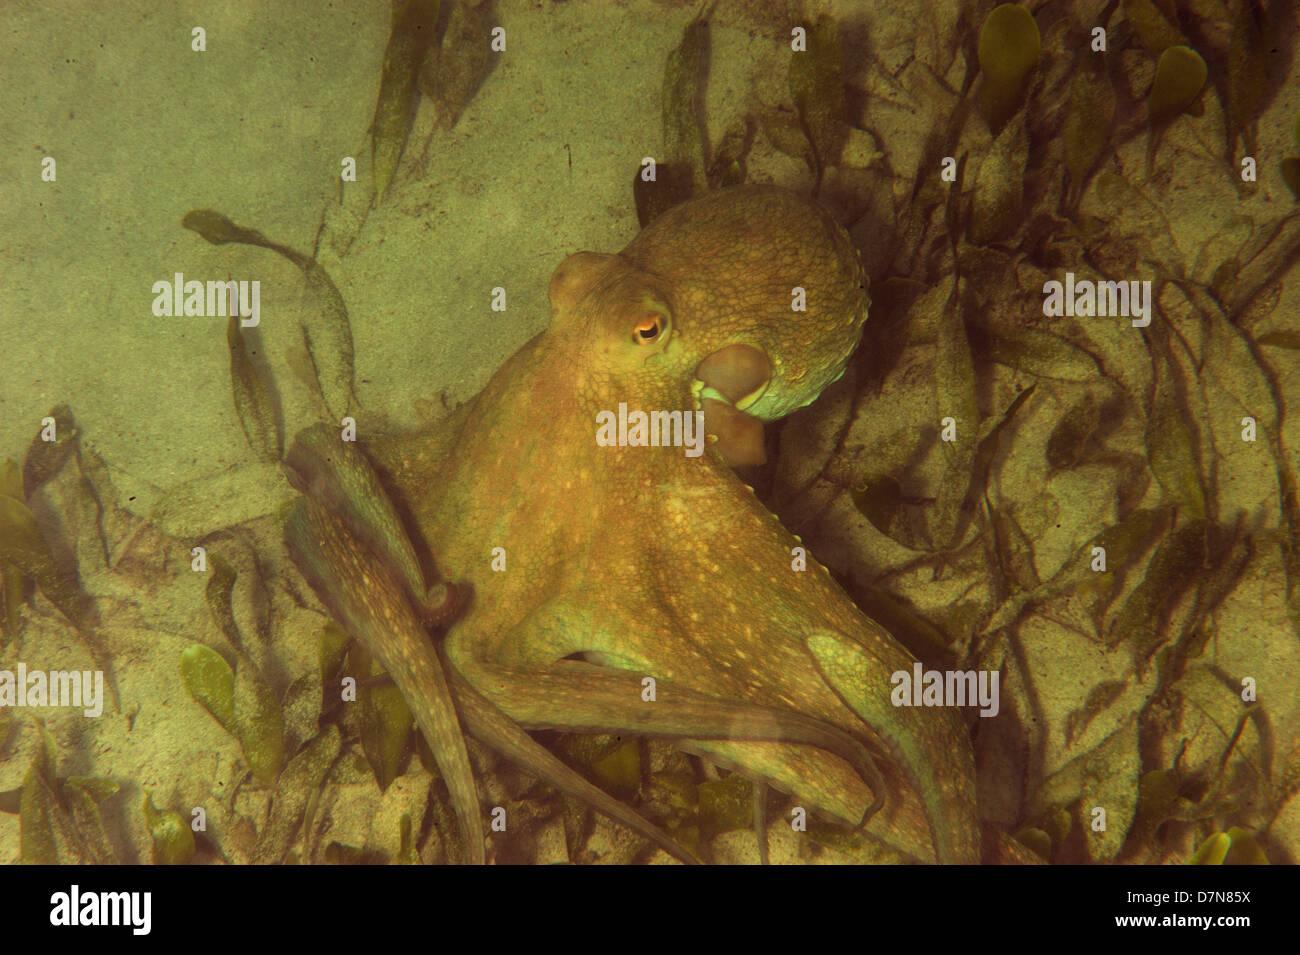 An octopus, plural: octopuses, octopi, or octopodes, is a cephalopod mollusc of the order Octopoda. - Stock Image